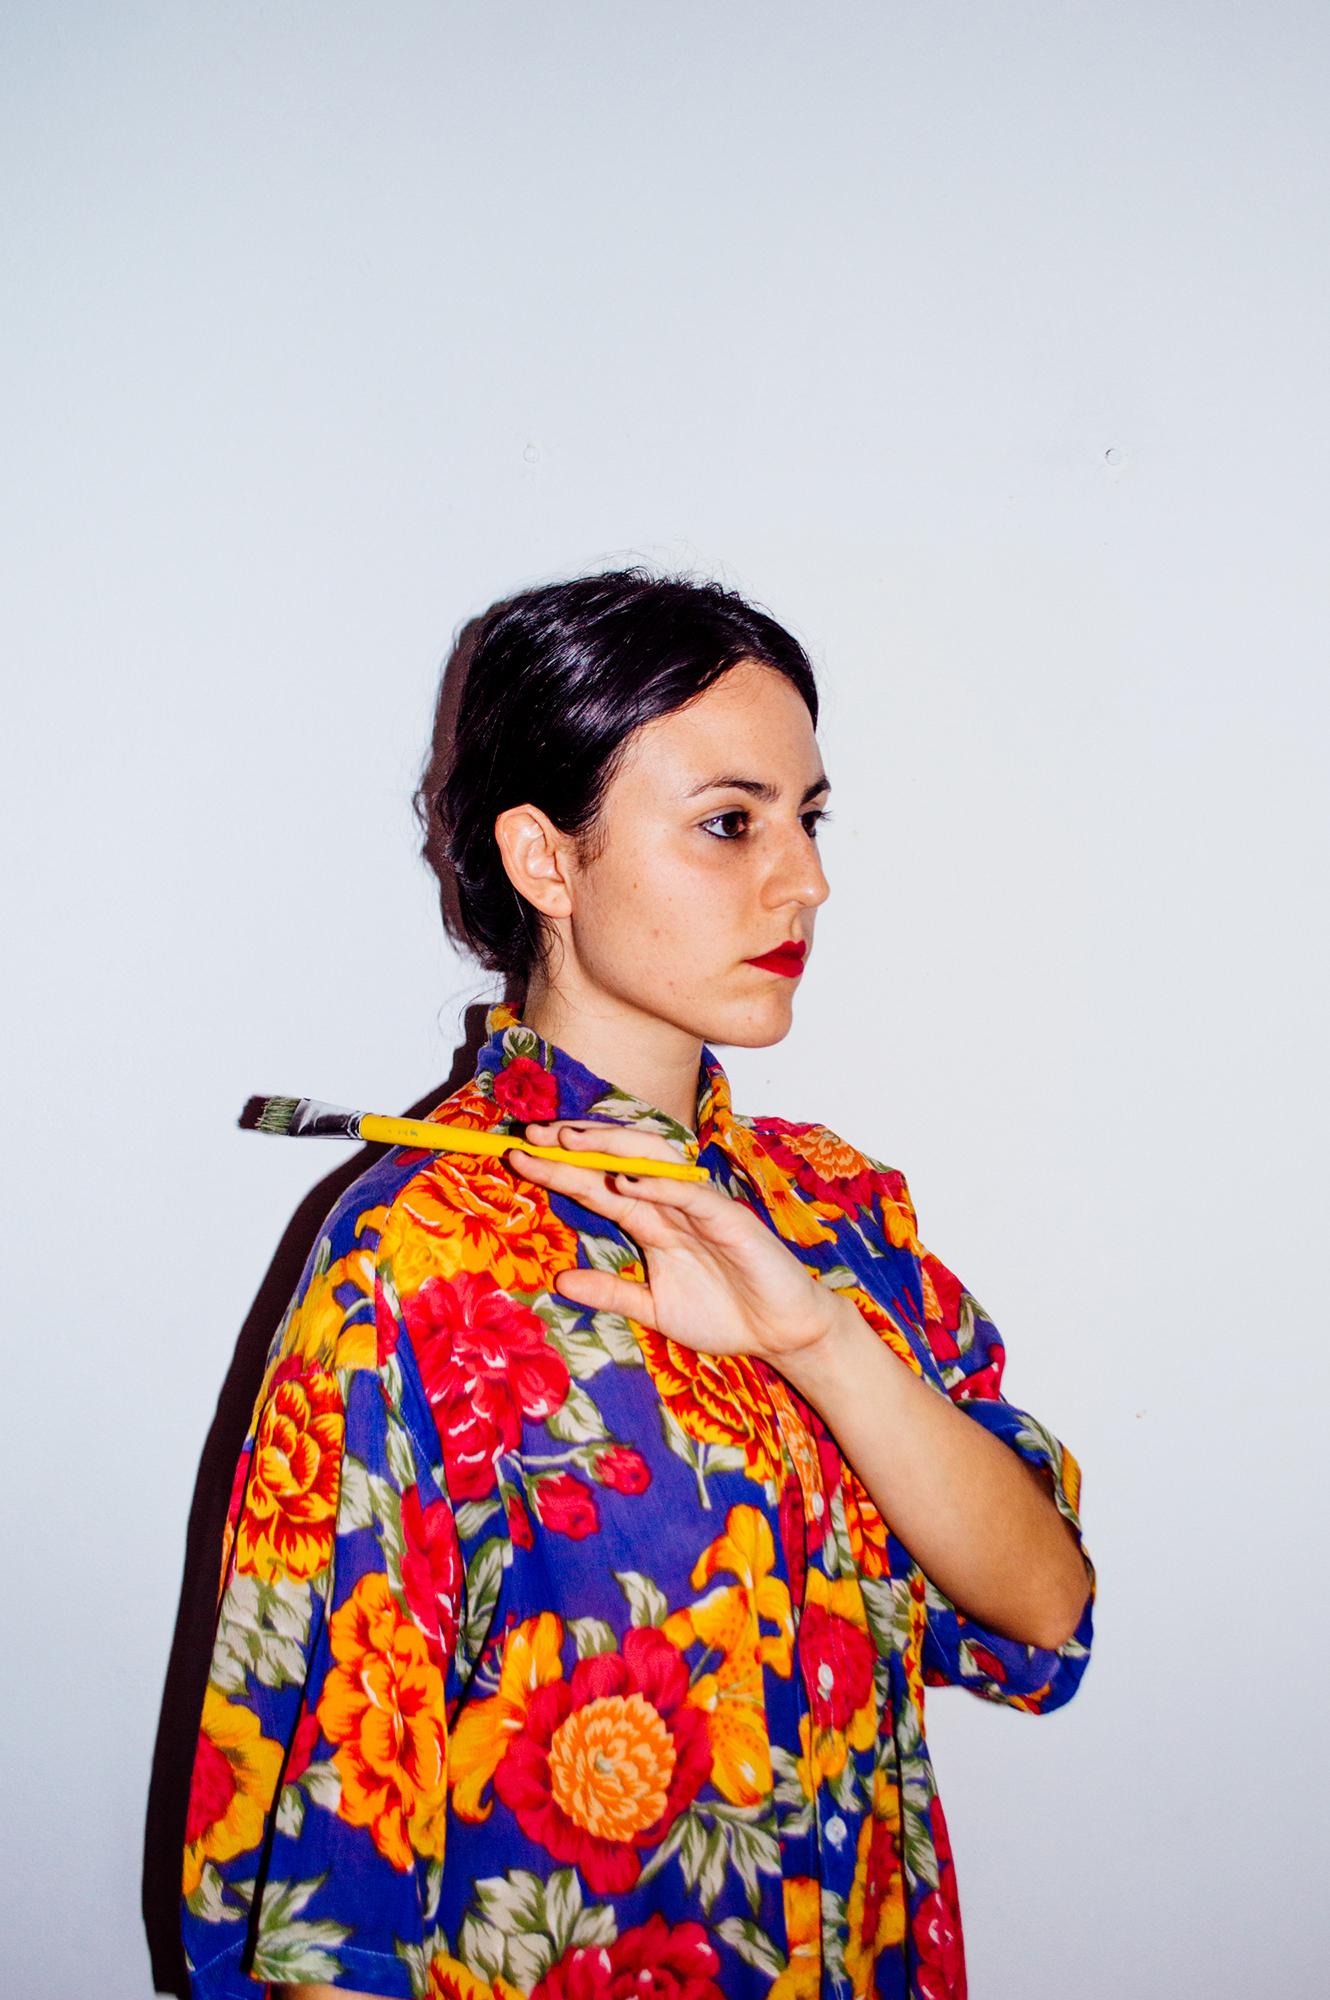 Juliana Coelho Martins